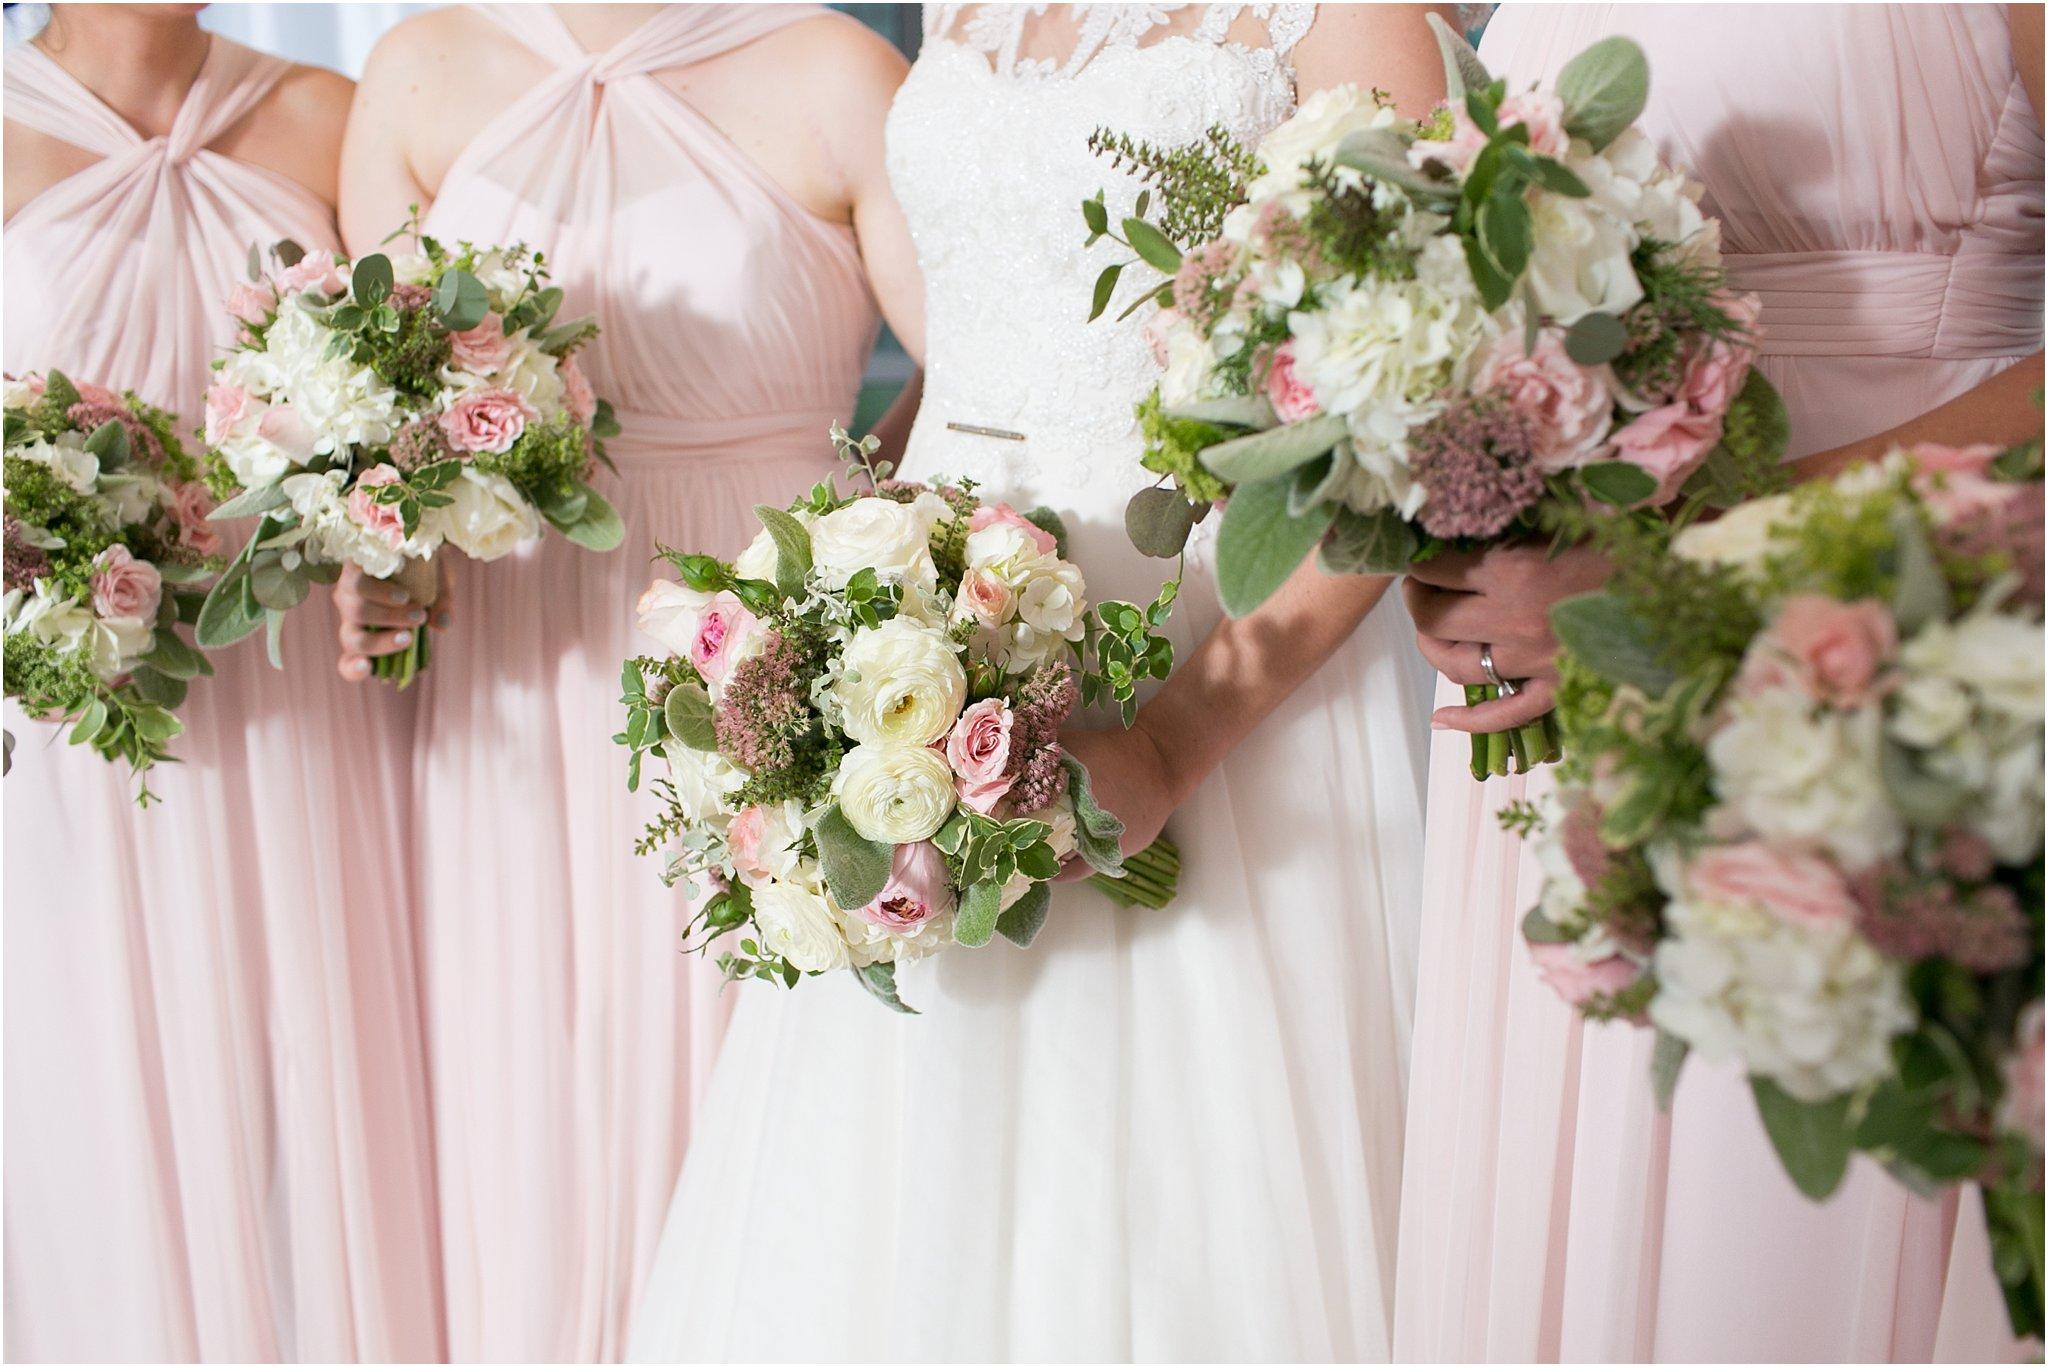 jessica_ryan_photography_virginia_wedding_photographer_wedding_hurricane_norfolk_botanical_gardens_hurricane_matthew_wedding_3584